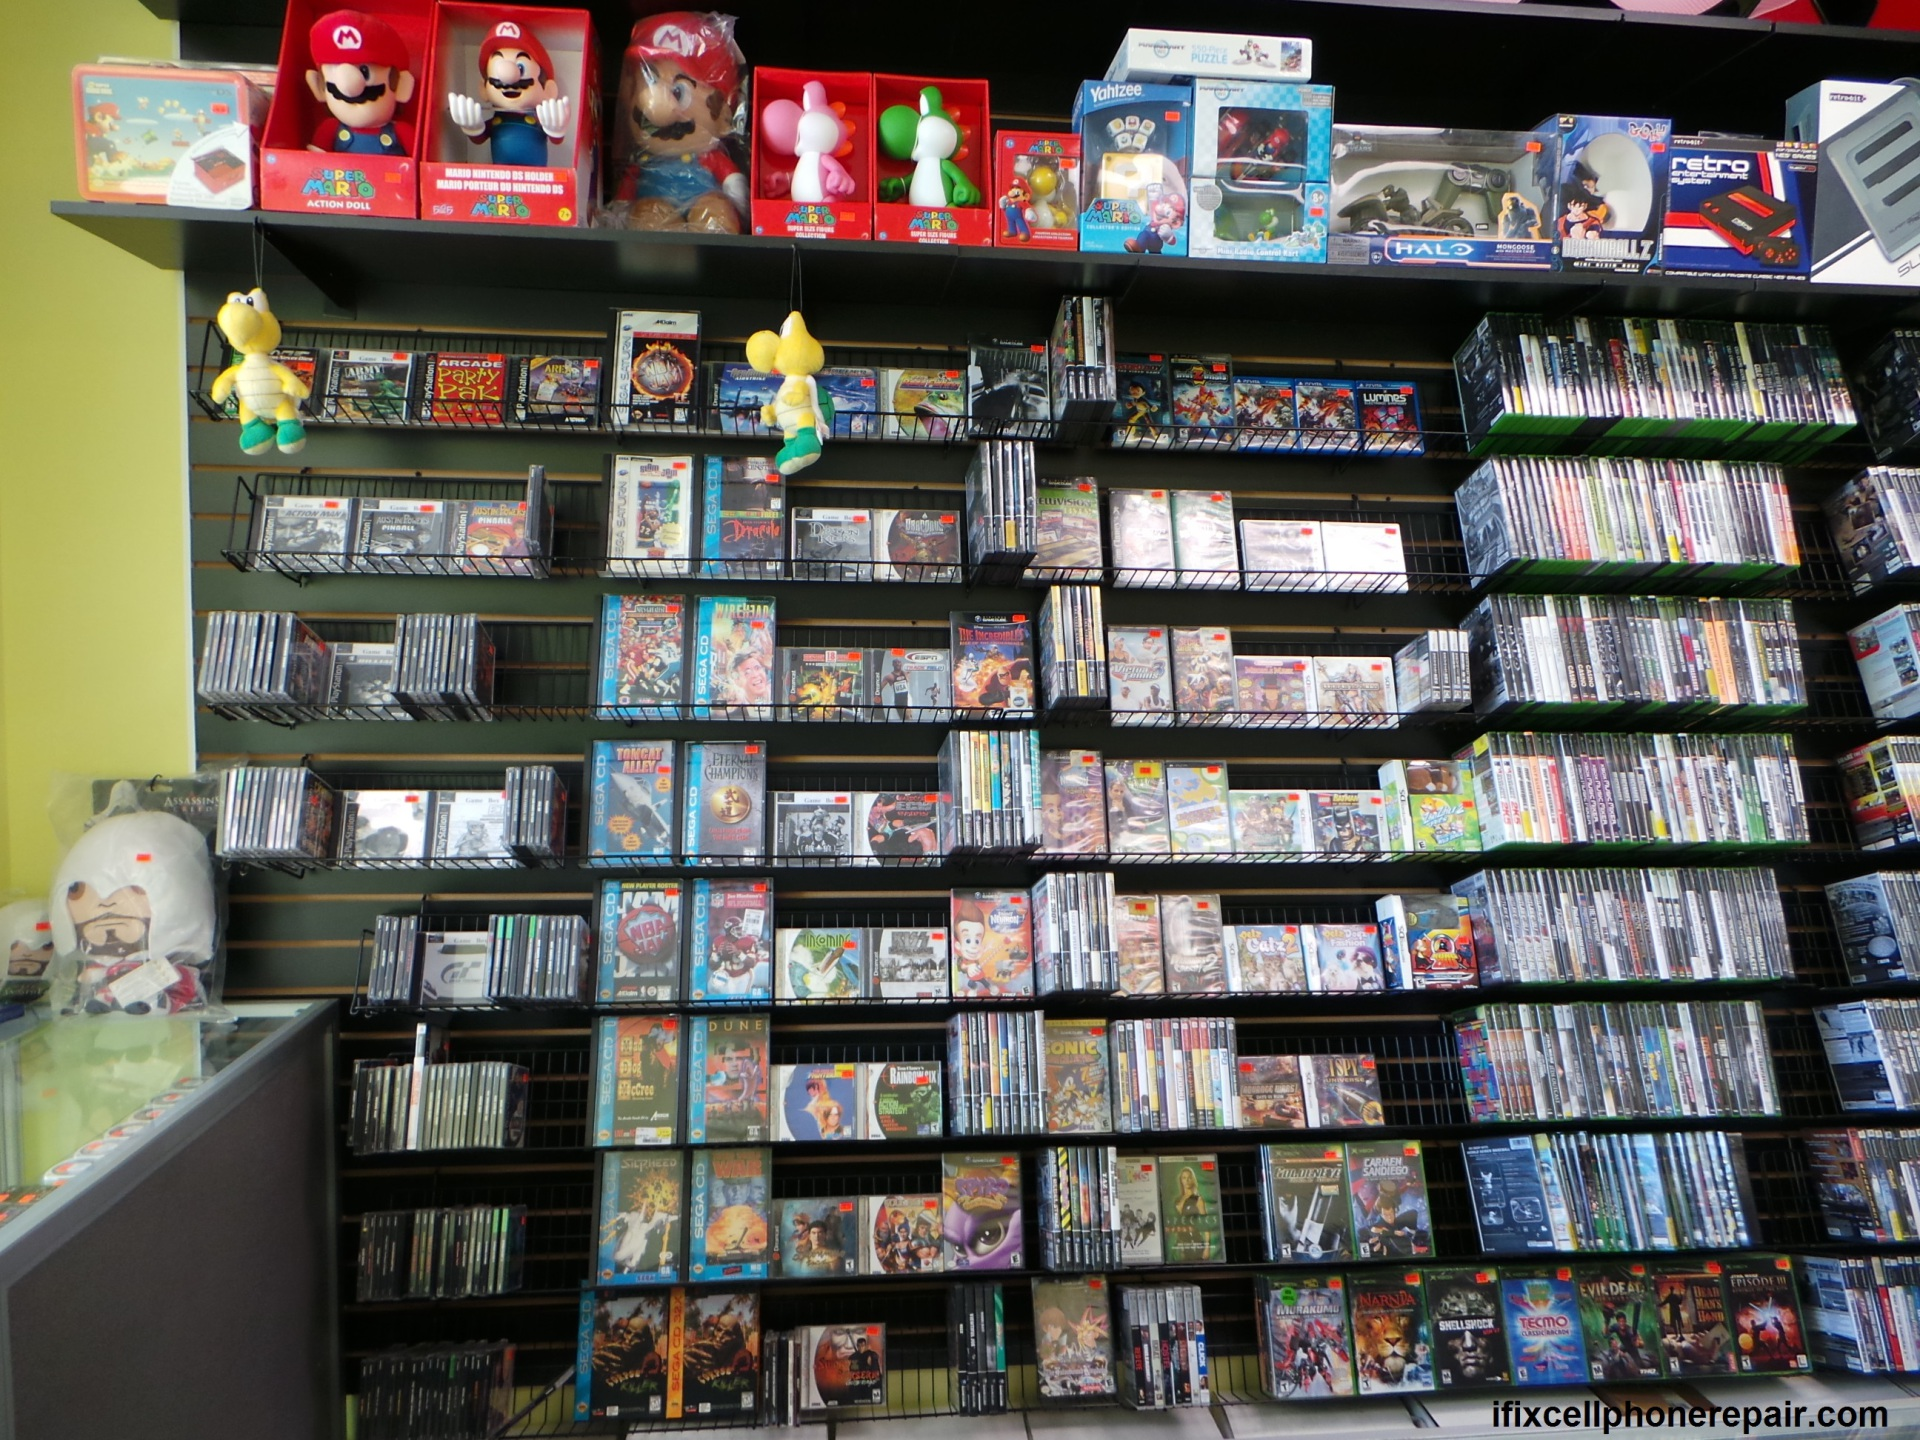 game box,mario plush,mario remote car,halo remote car,game console bags,game gun,ifix,cell phone repair,ipad repair,game console repair,scratch cds